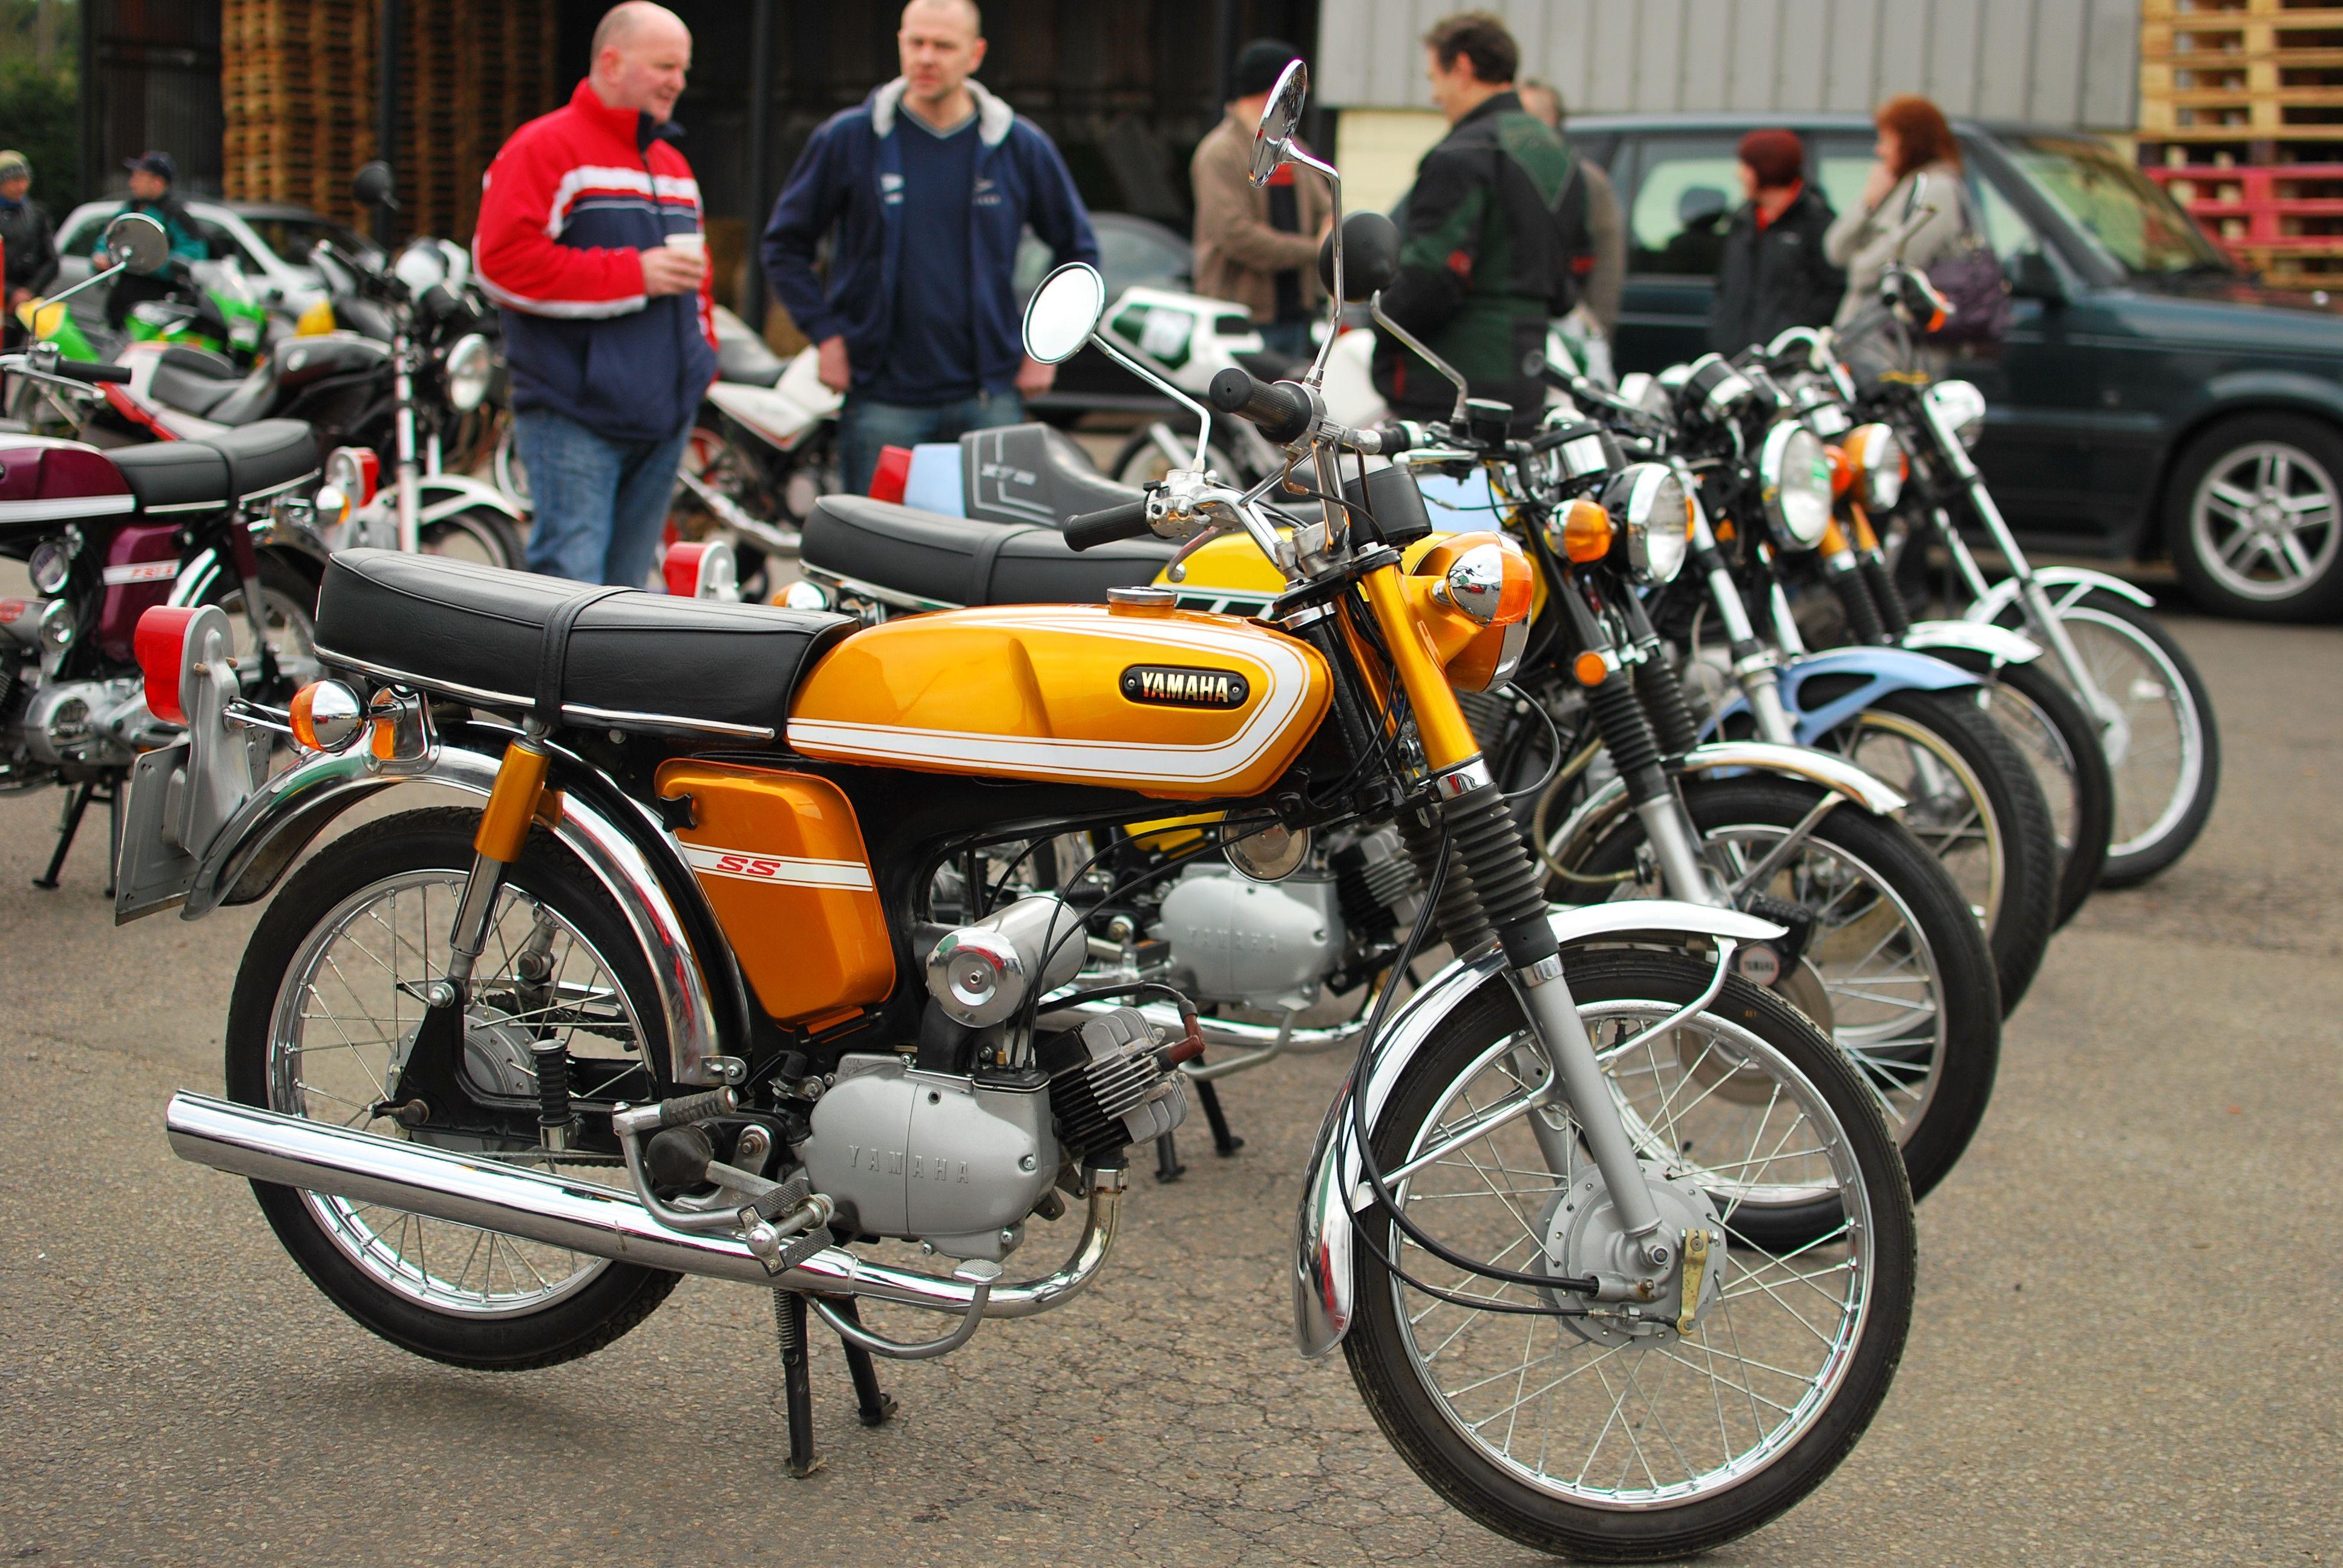 This Was A 16 Year Olds Dream In The 70s 80s Yamaha Fs1e Oc Yamaha Yamaha Bikes Yamaha Motorcycles